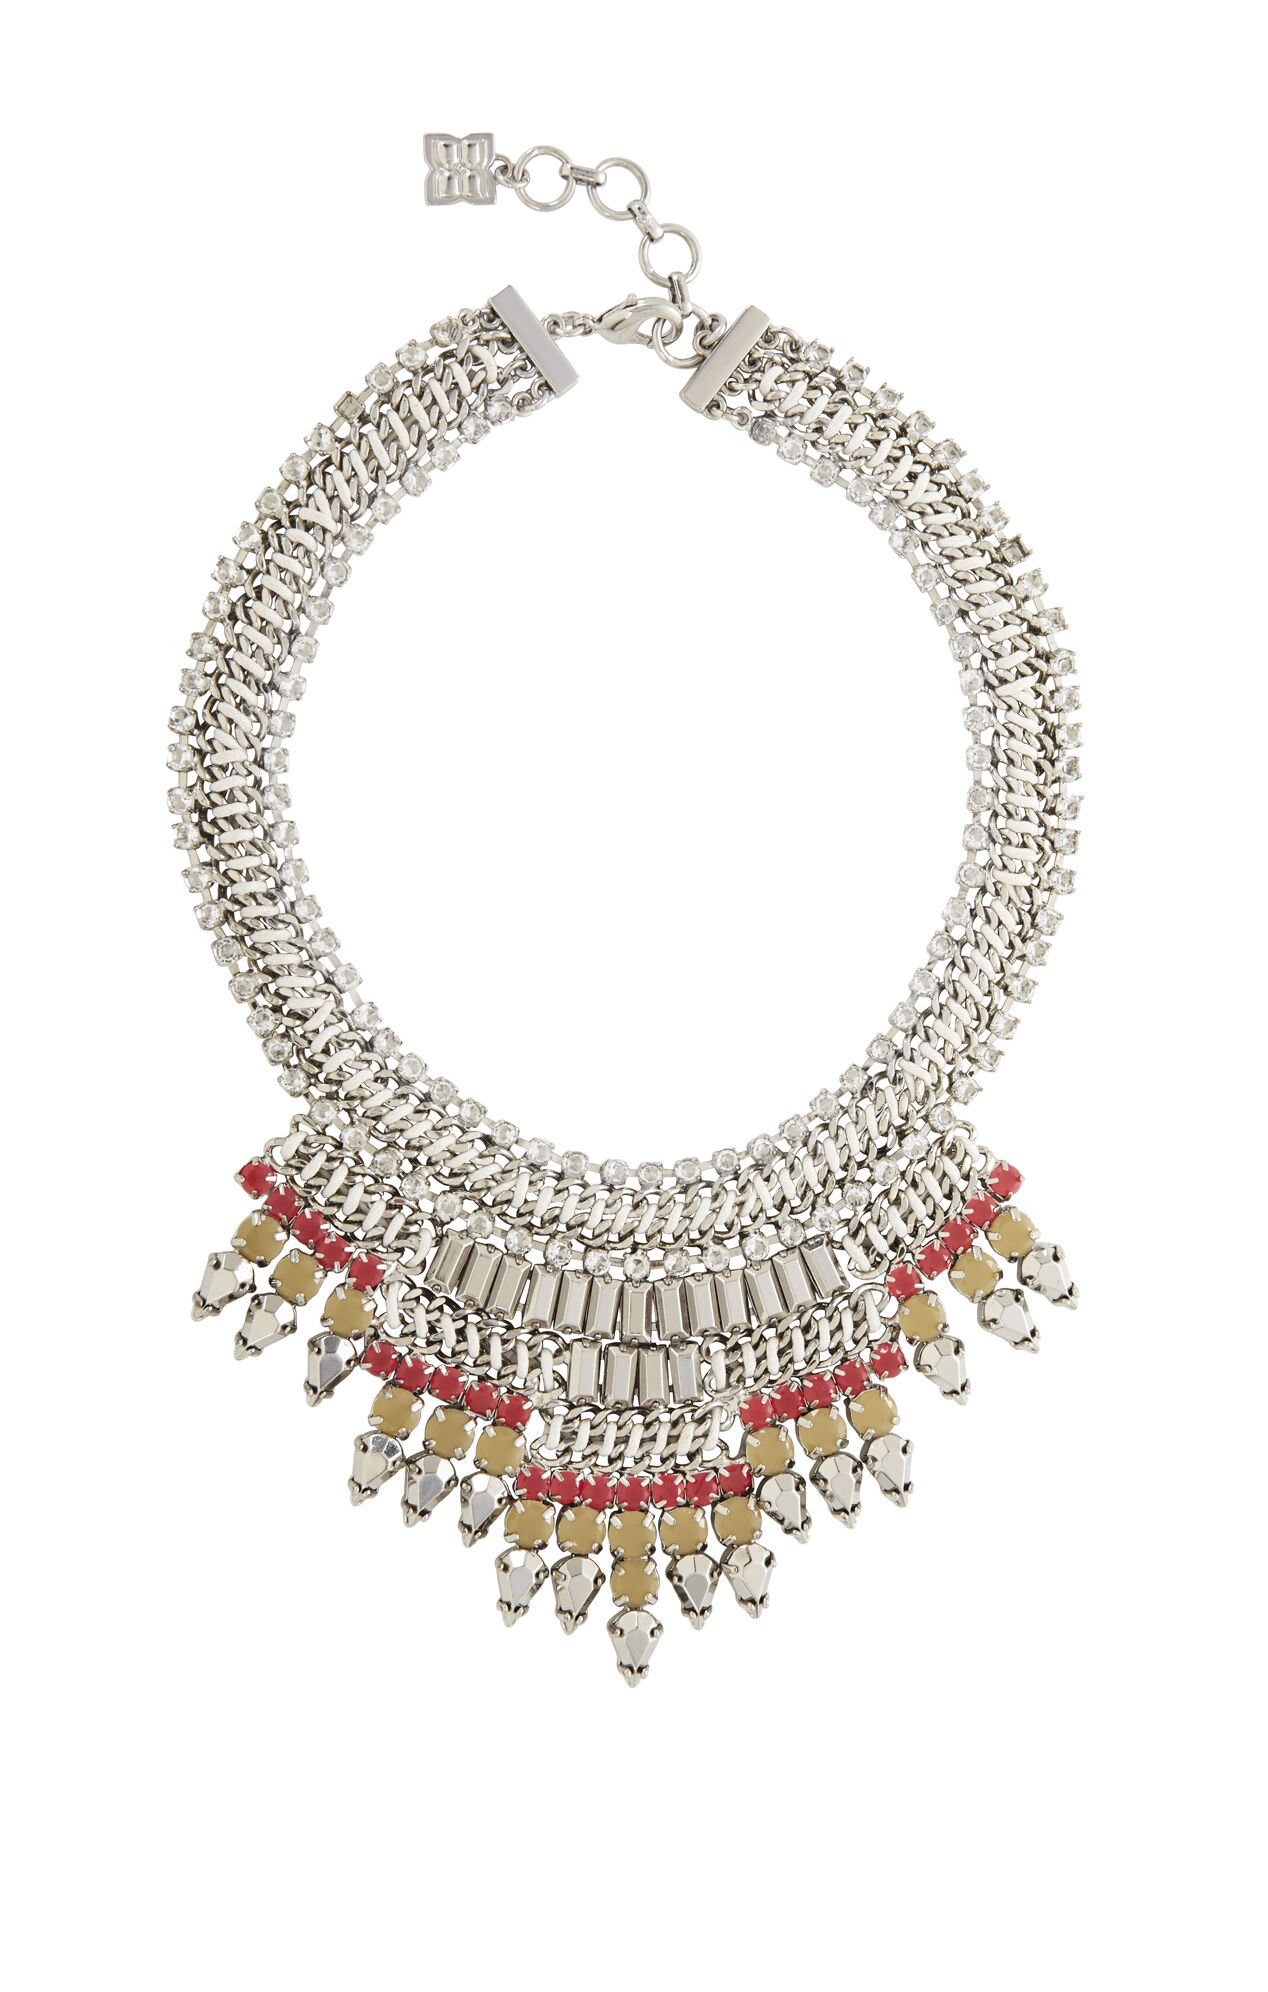 Baguette-Stone Statement Necklace